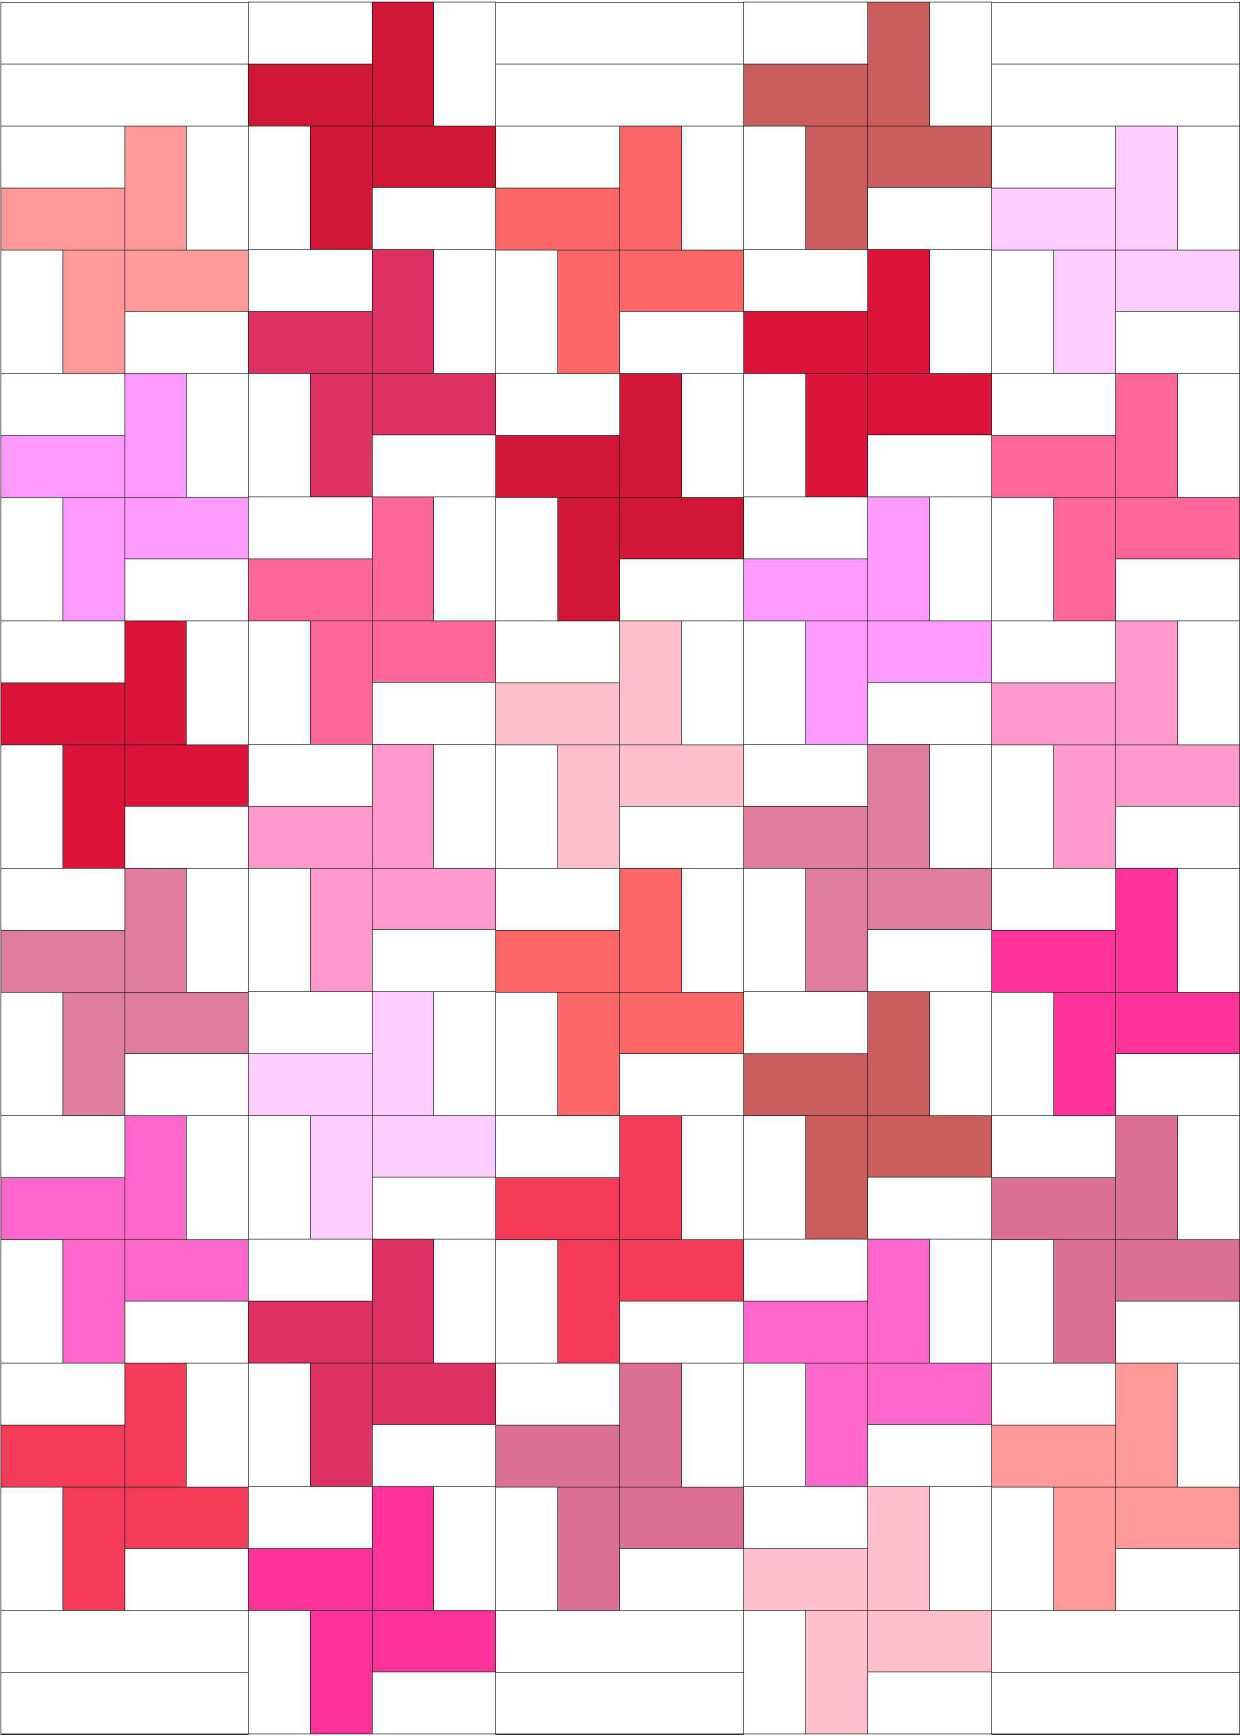 Pink Pinwheels quilt designed in EQ7